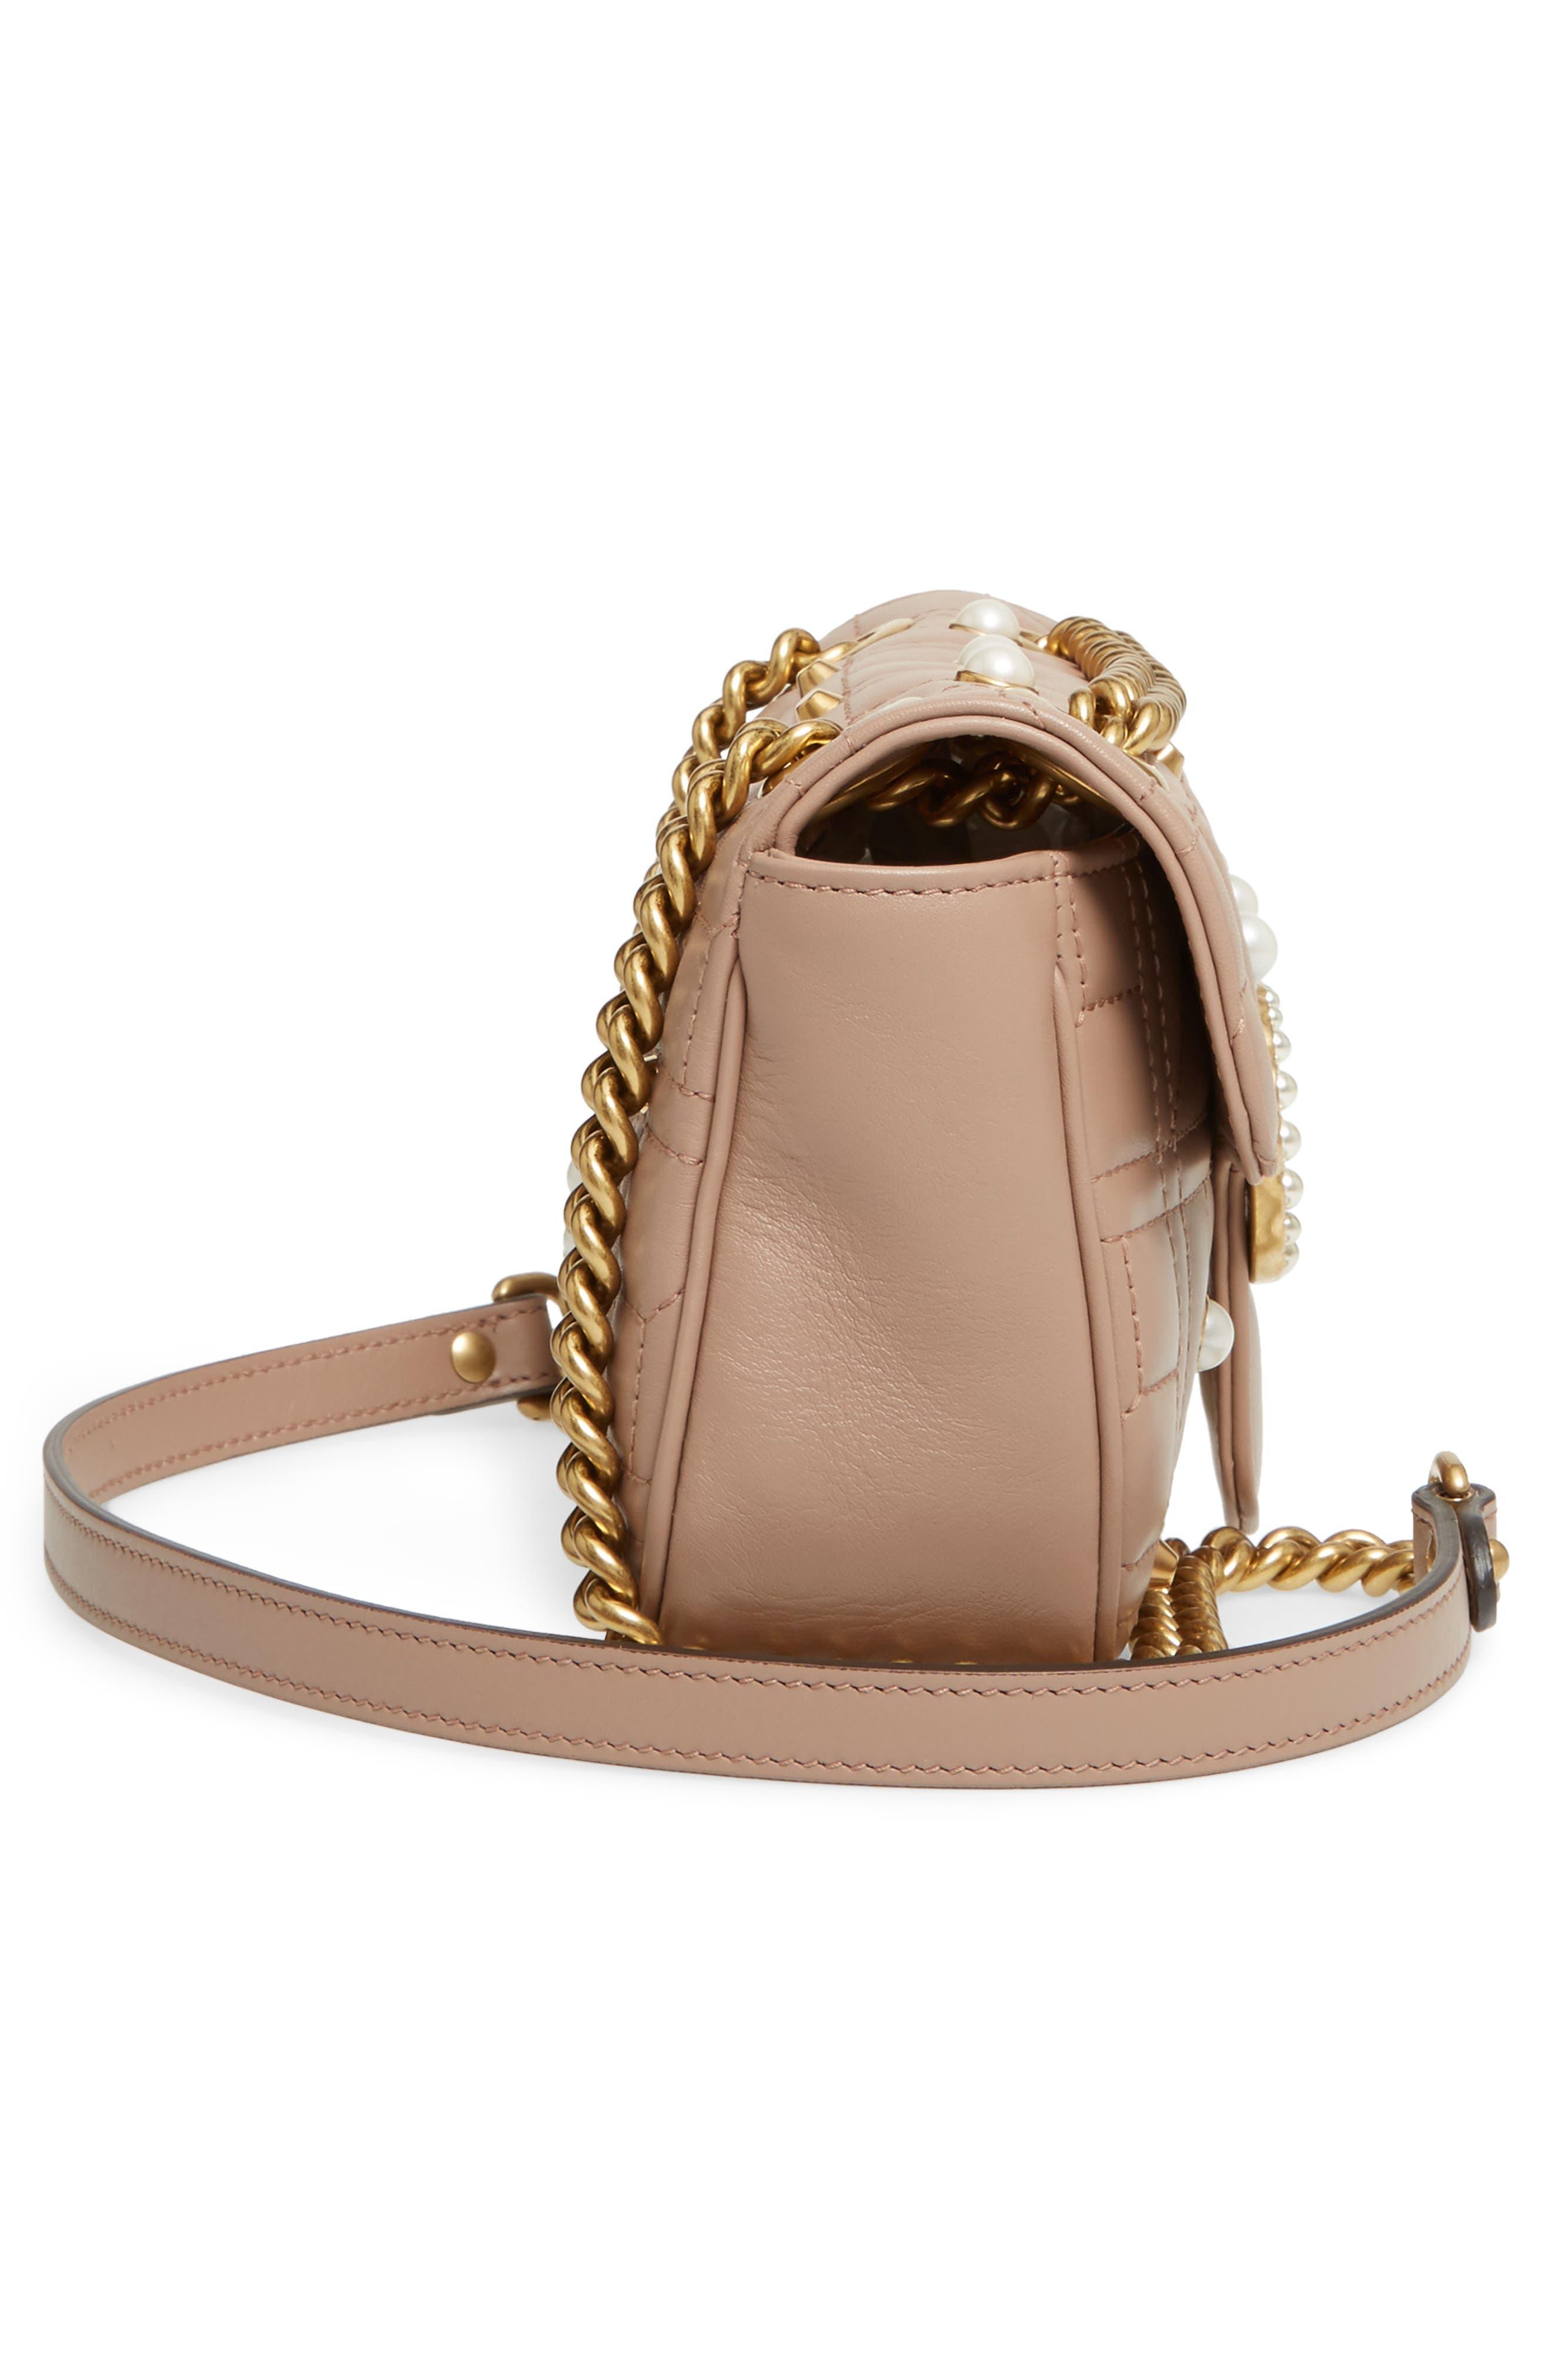 Mini GG Marmont 2.0 Imitation Pearl Logo Matelassé Leather Shoulder Bag,                             Alternate thumbnail 5, color,                             651